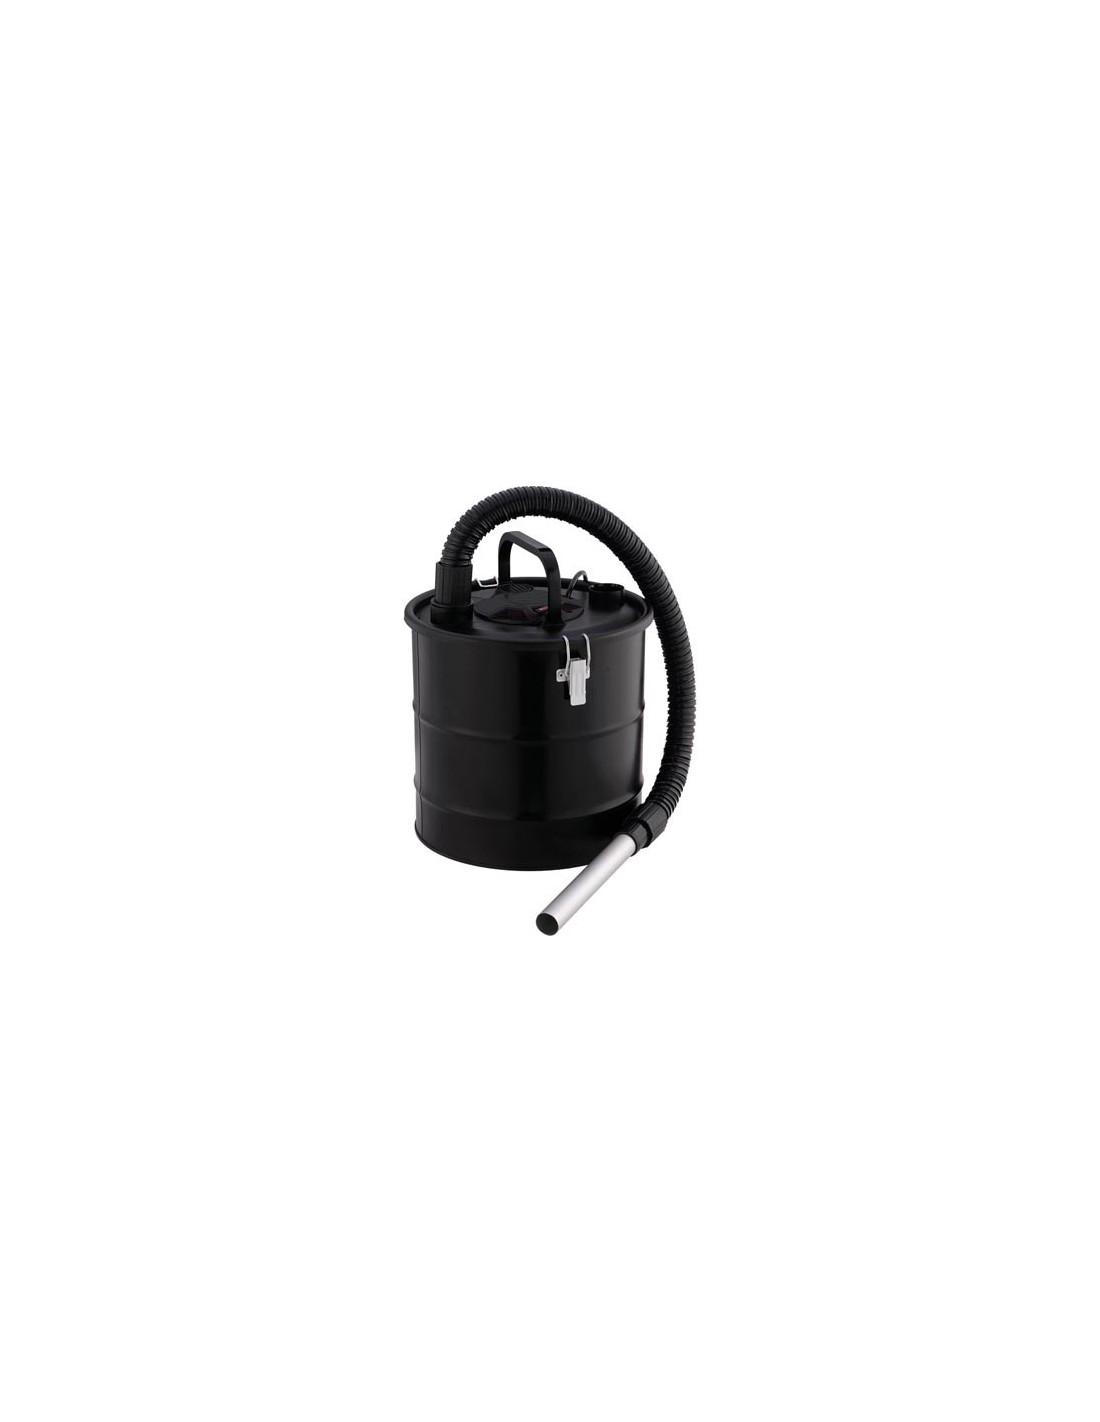 aspirateur cendres de chemin e 800w 18 litres. Black Bedroom Furniture Sets. Home Design Ideas